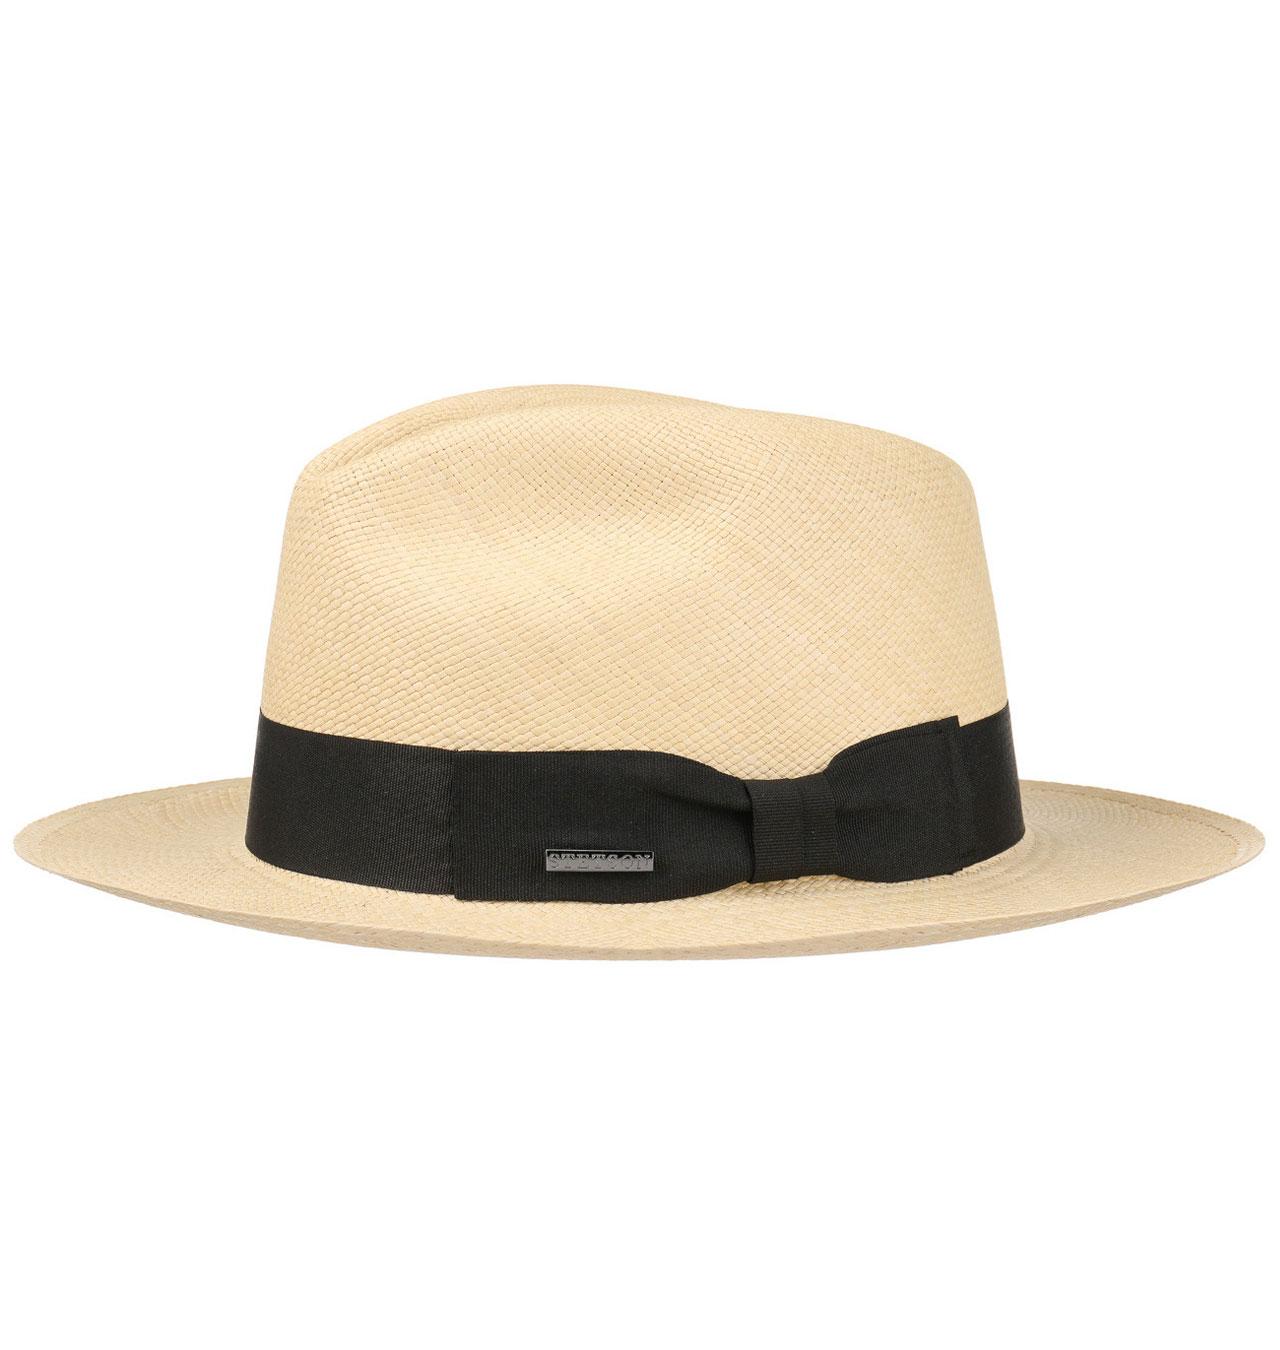 08b442103a60 Stetson---Valmora-Fedora-Panama-Hat---Natural-1.jpg